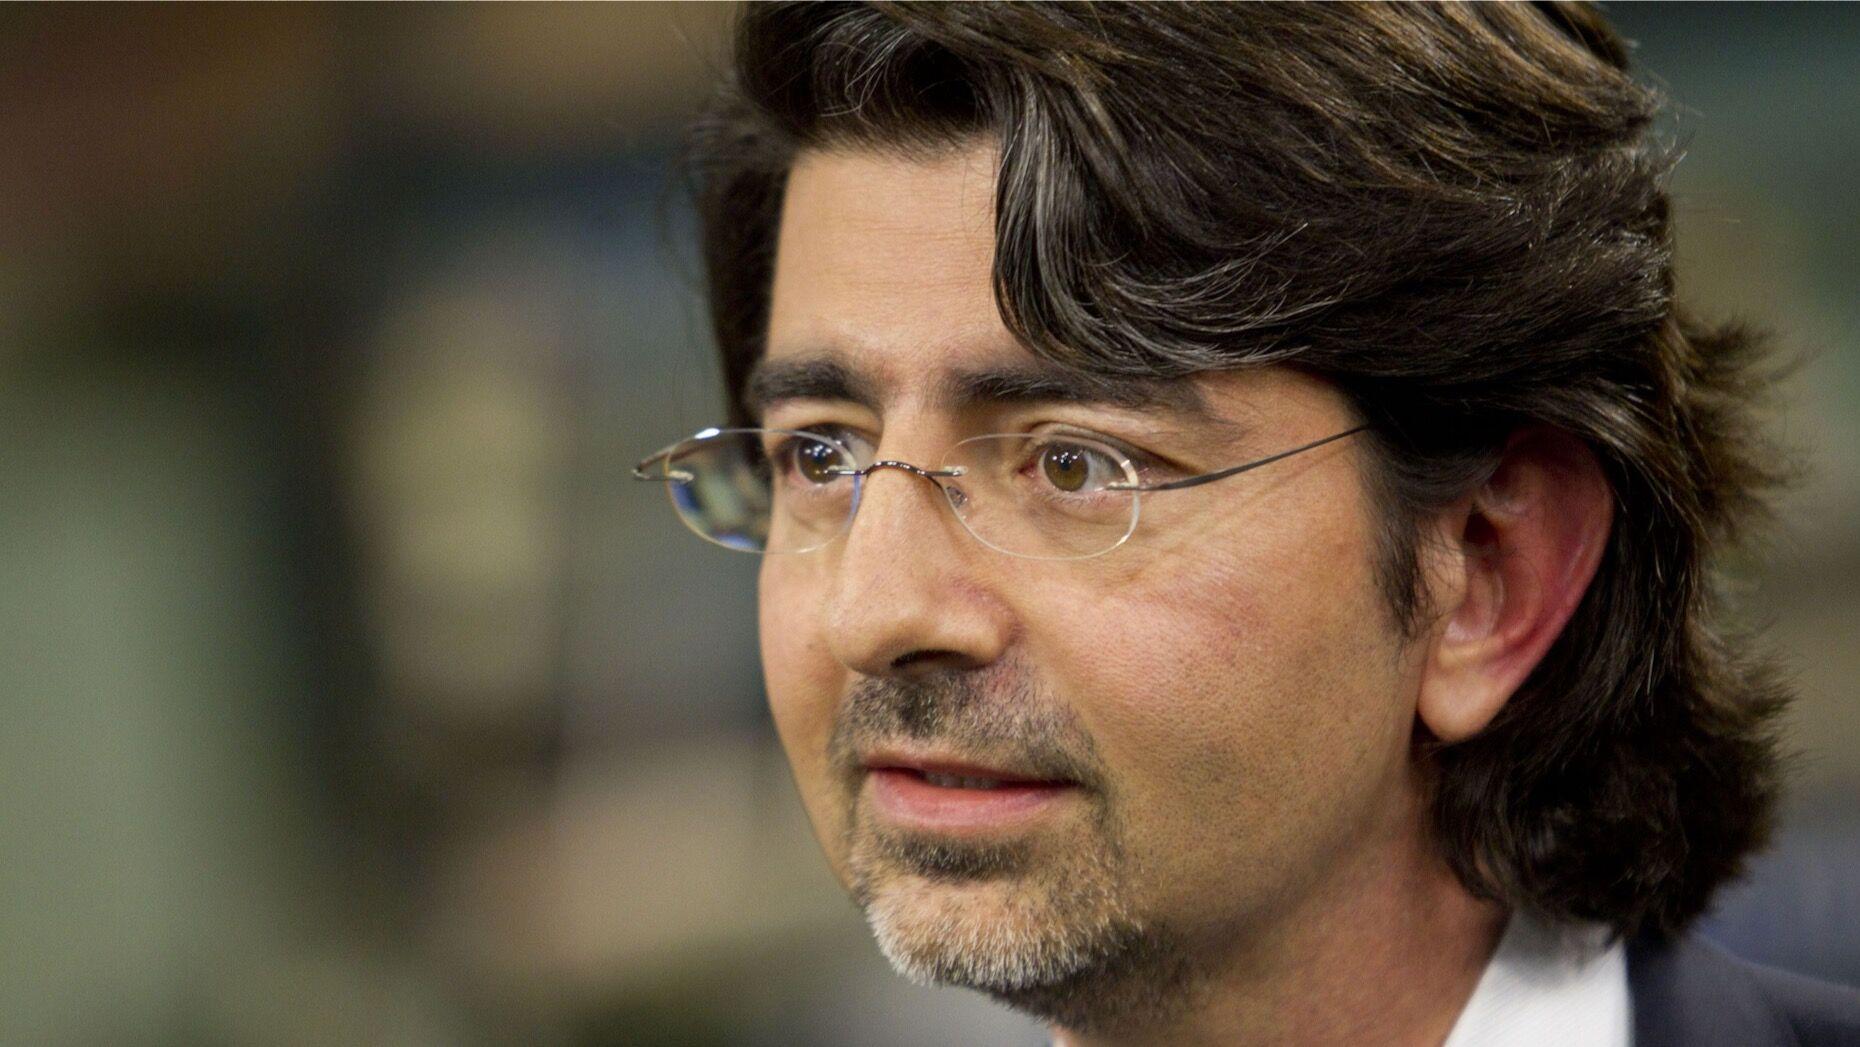 Pierre Omidyar, shown in 2010. Photo: Bloomberg